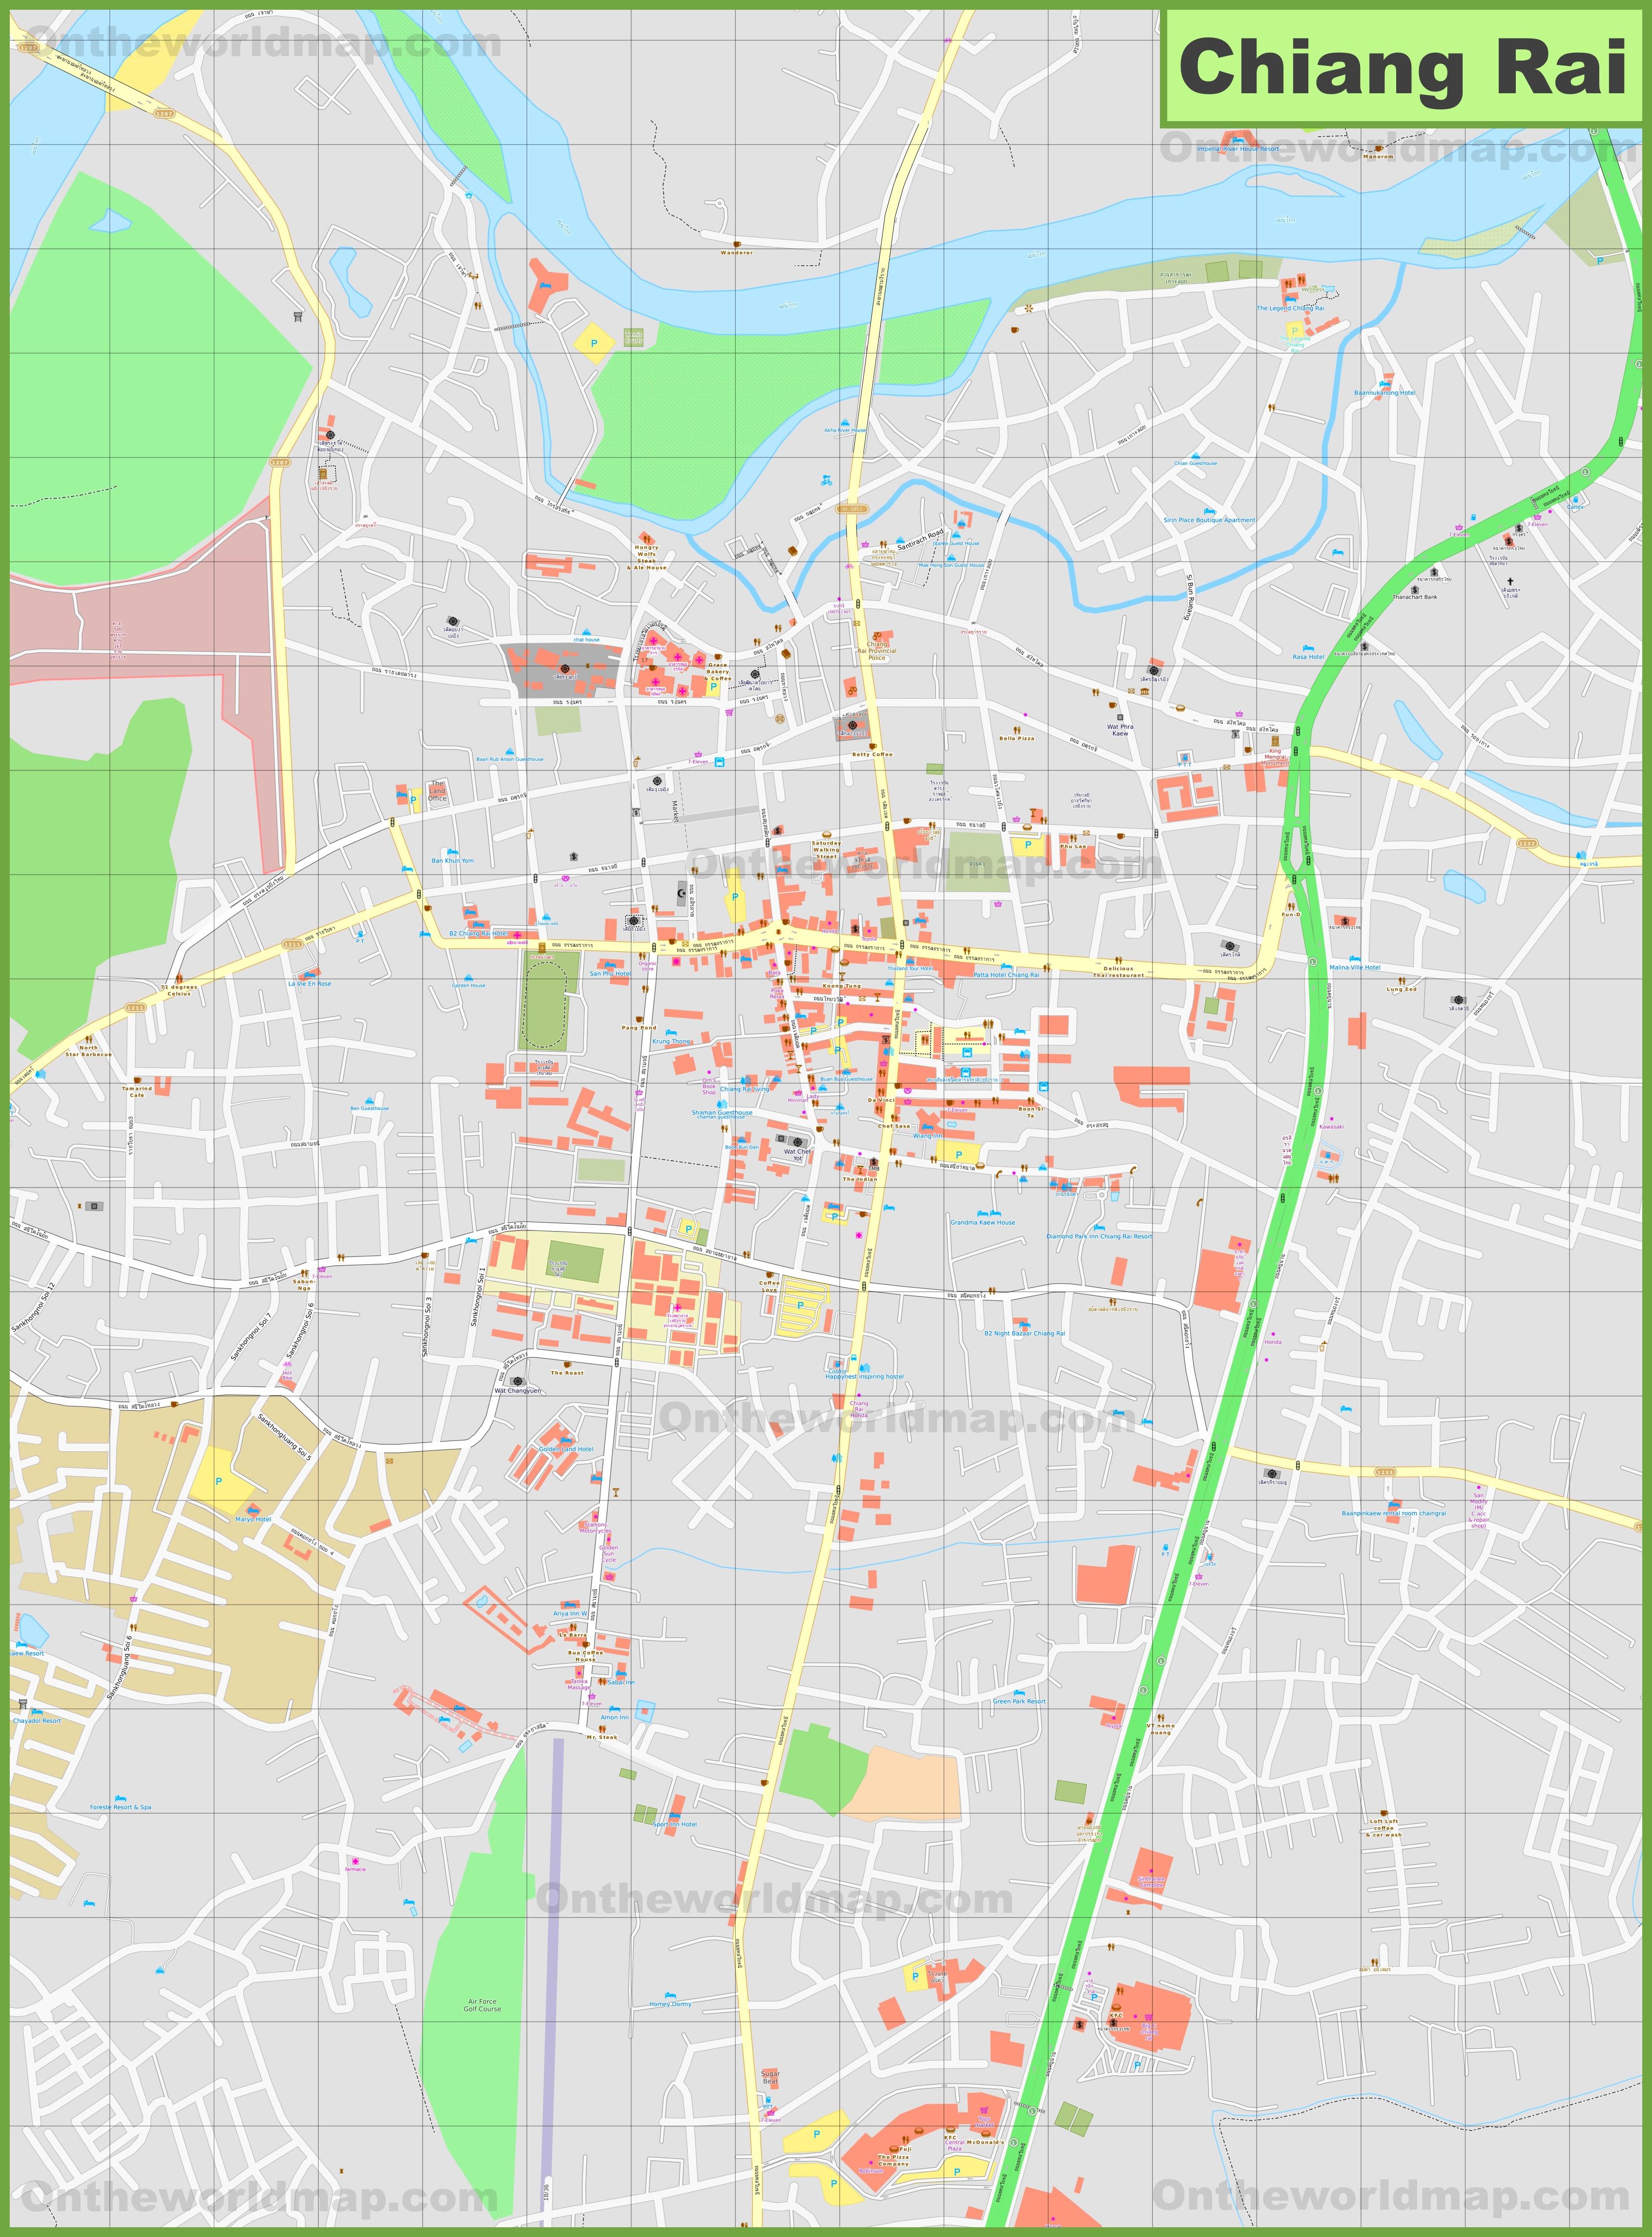 Chiang Rai Maps Thailand Maps of Chiang Rai City